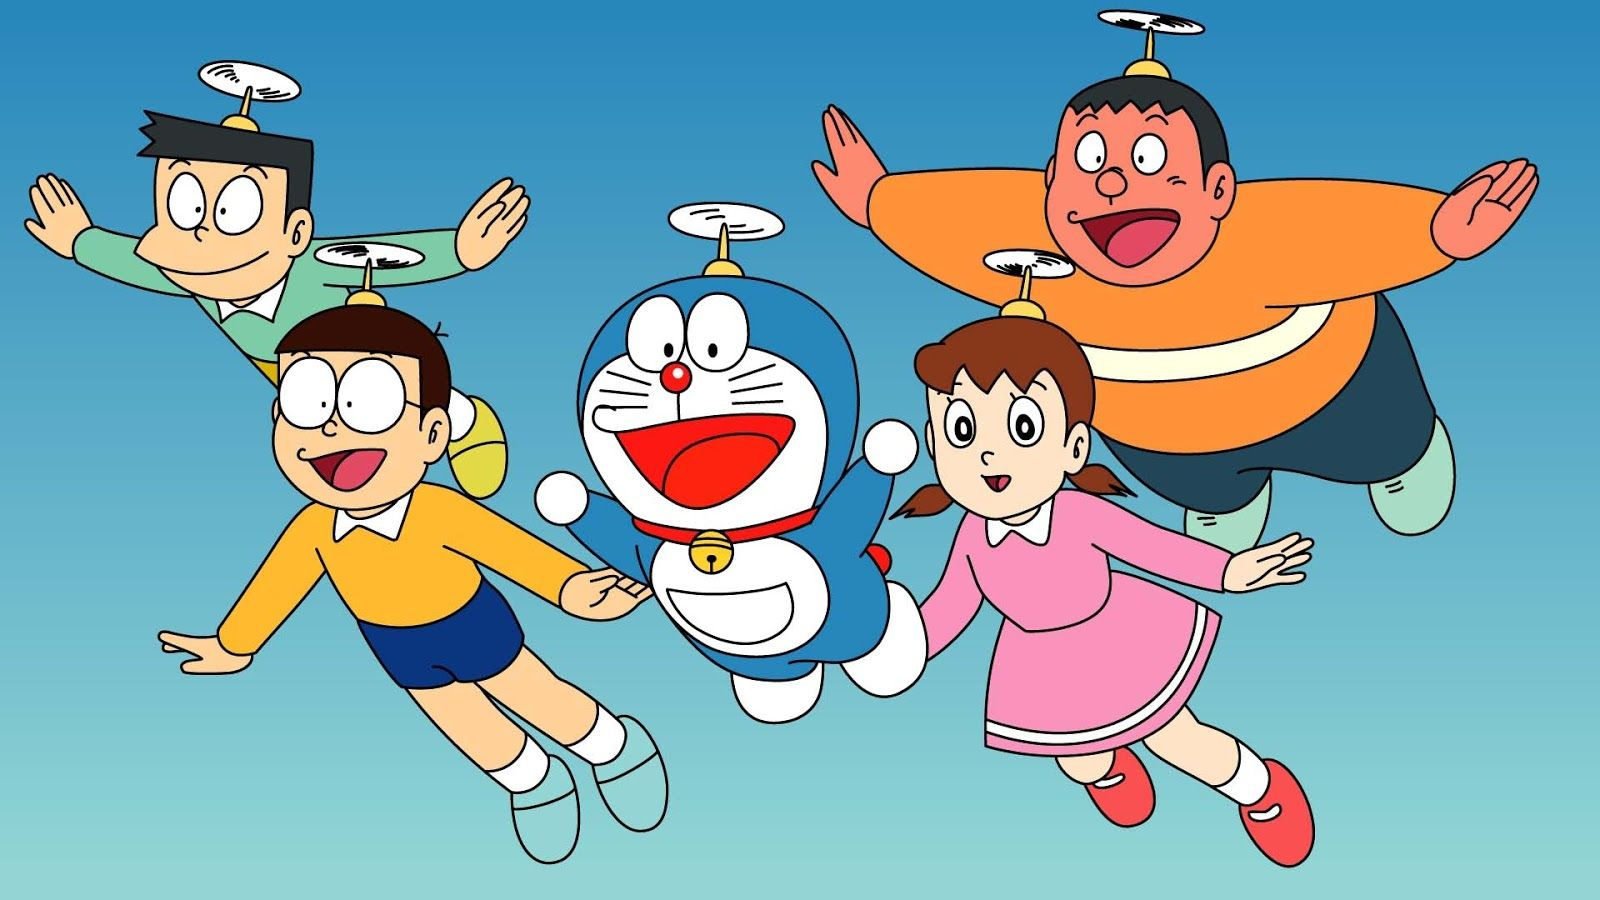 Gambar Doraemon Lucu Dan Imut Buat Wallpaper Di 2020